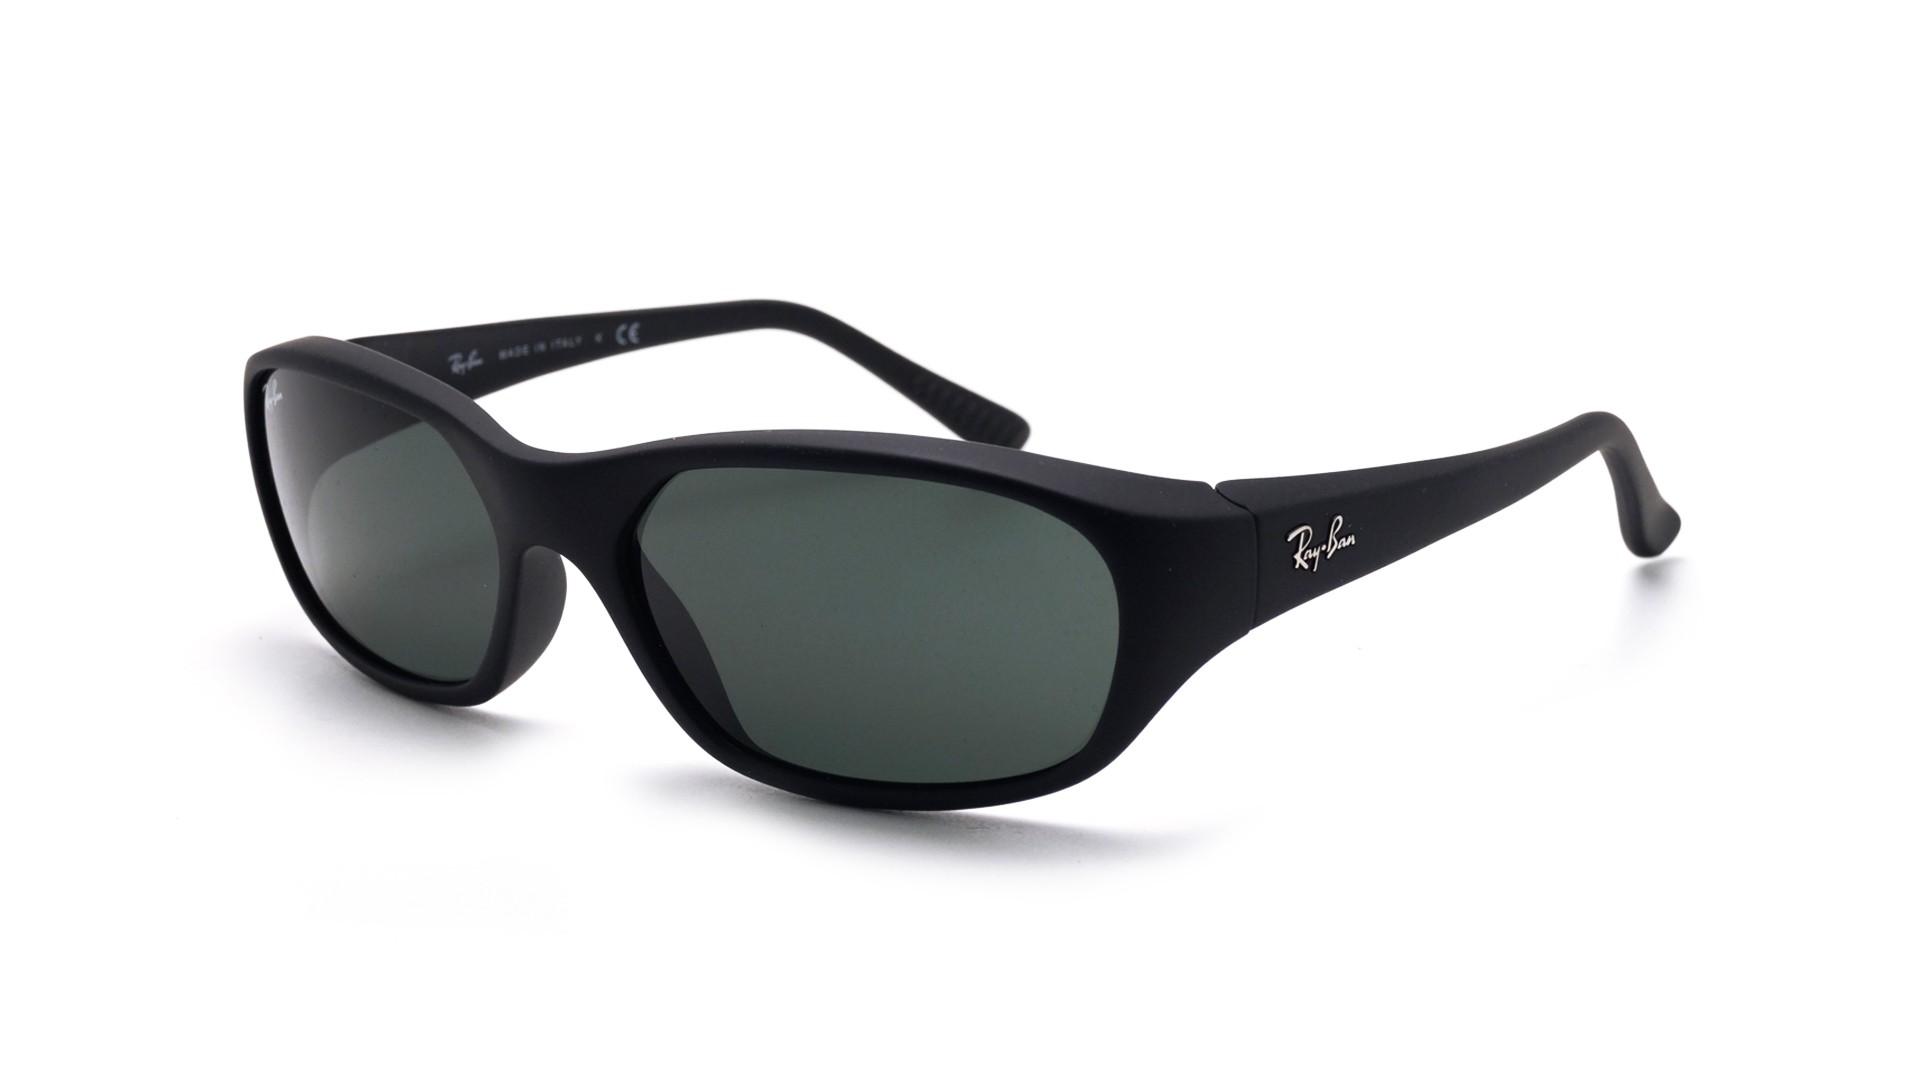 ee9e3b3097 Sunglasses Ray-Ban Daddy-o II Black Matte G-15 RB2016 W2578 59-170 Medium. 1  review